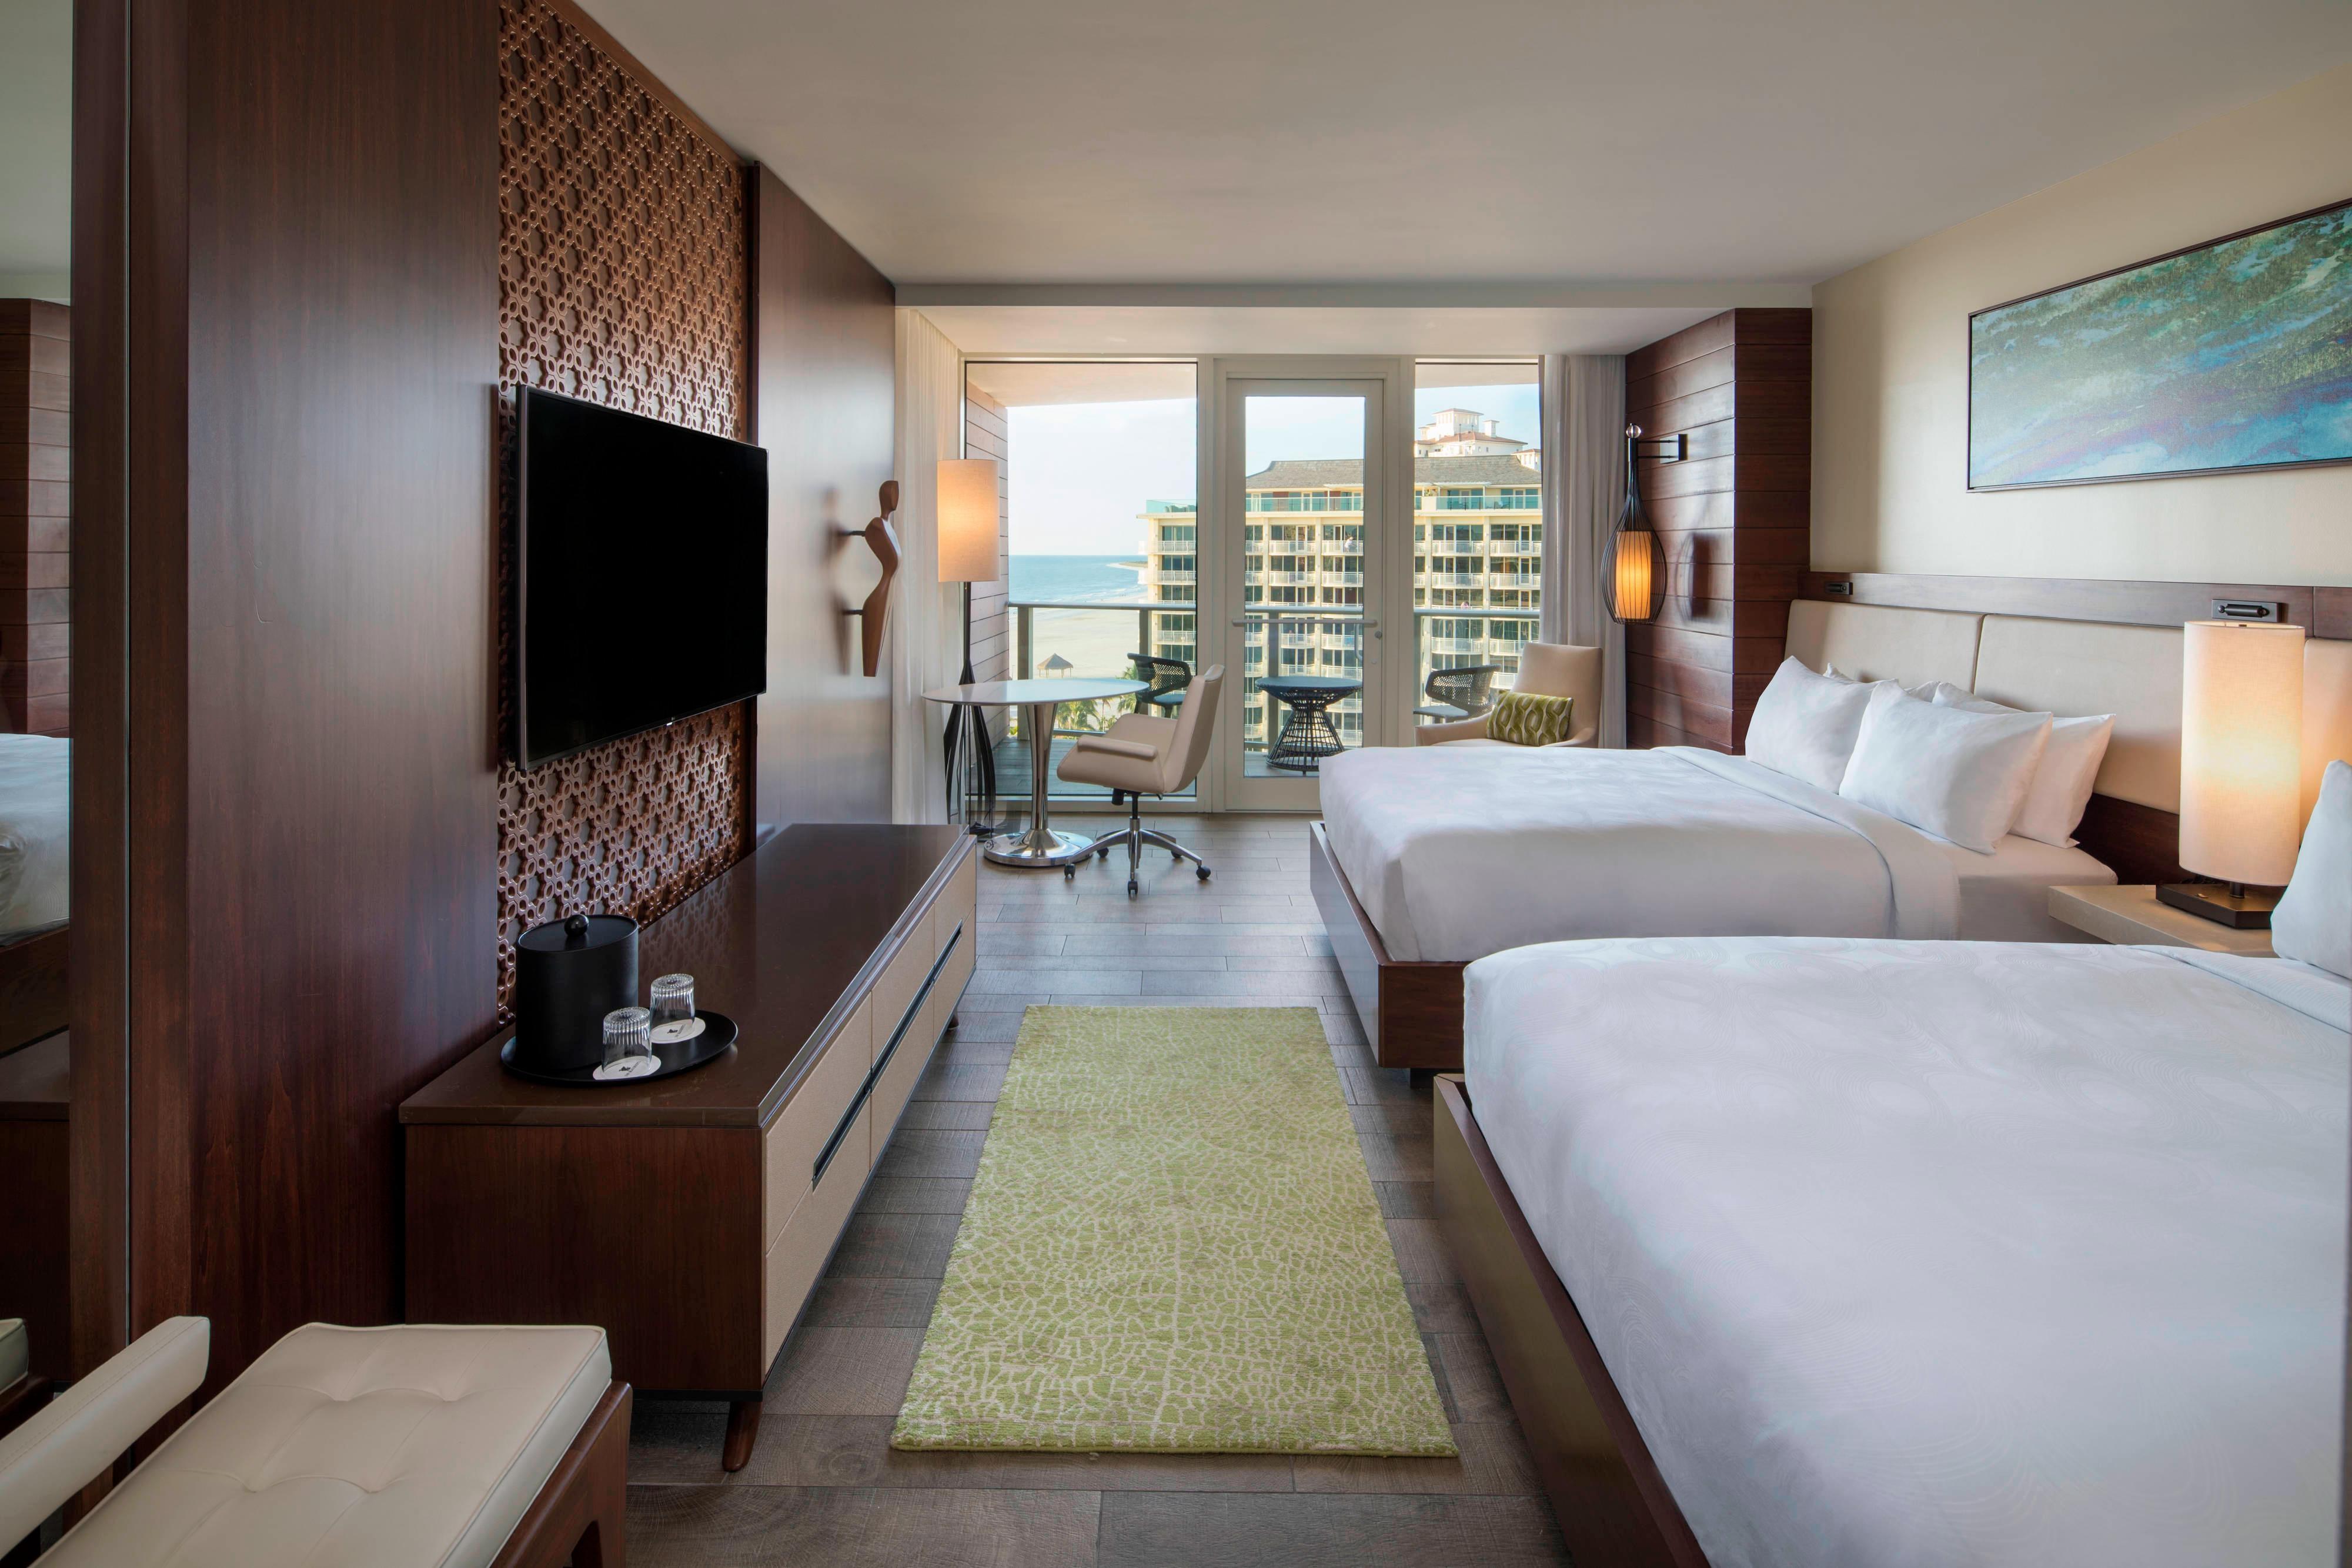 Adult Exclusive - Partial Gulf View Queen/Queen Guest Room